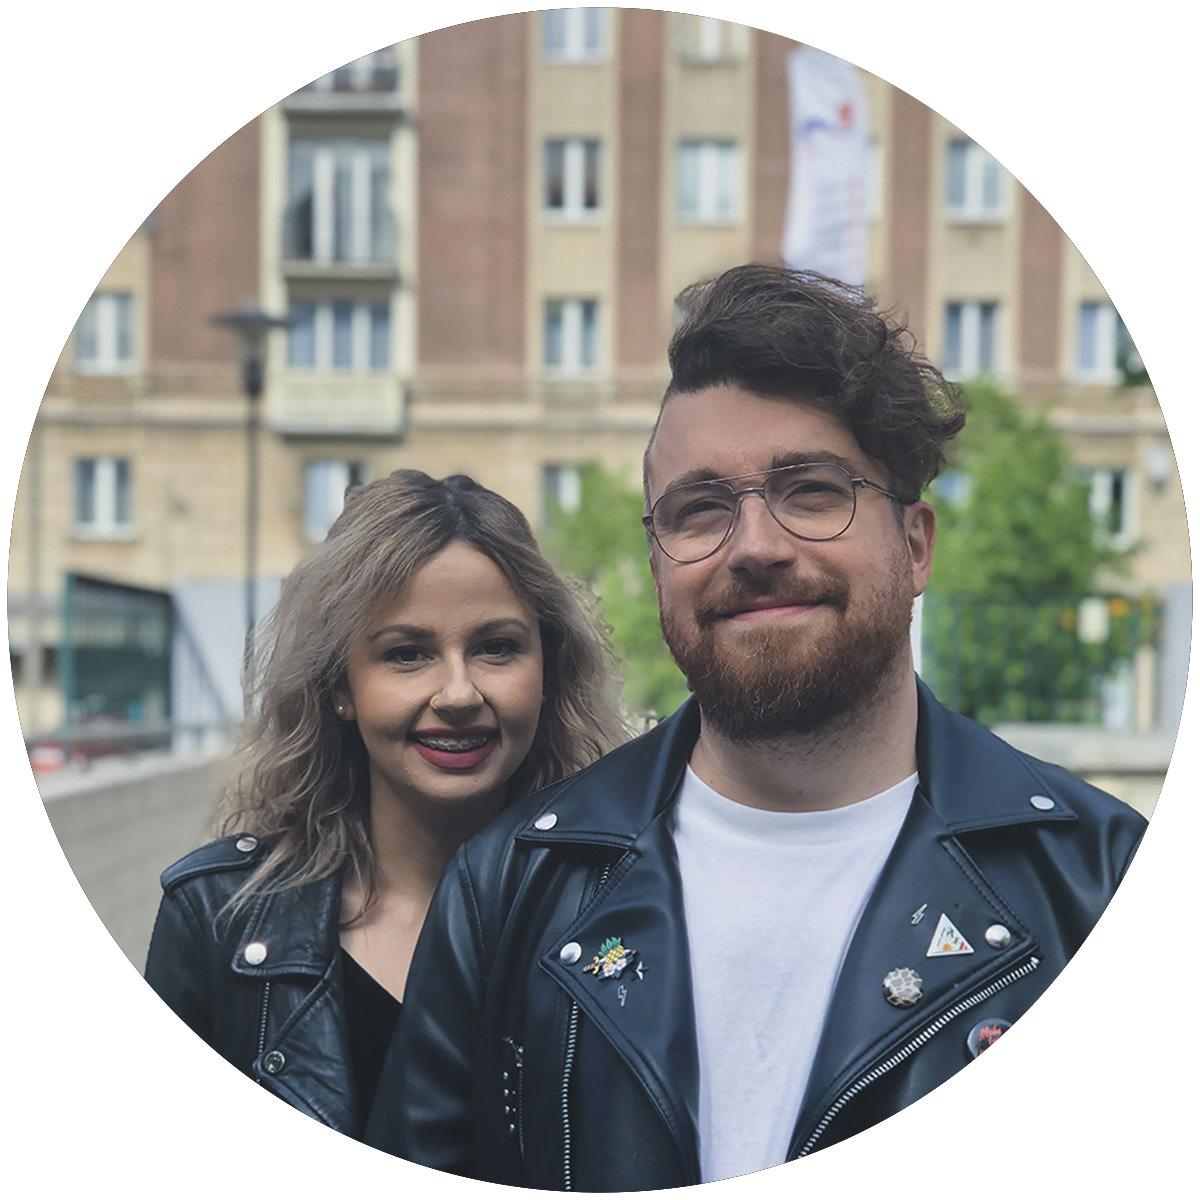 Liam & Natalie Gordon